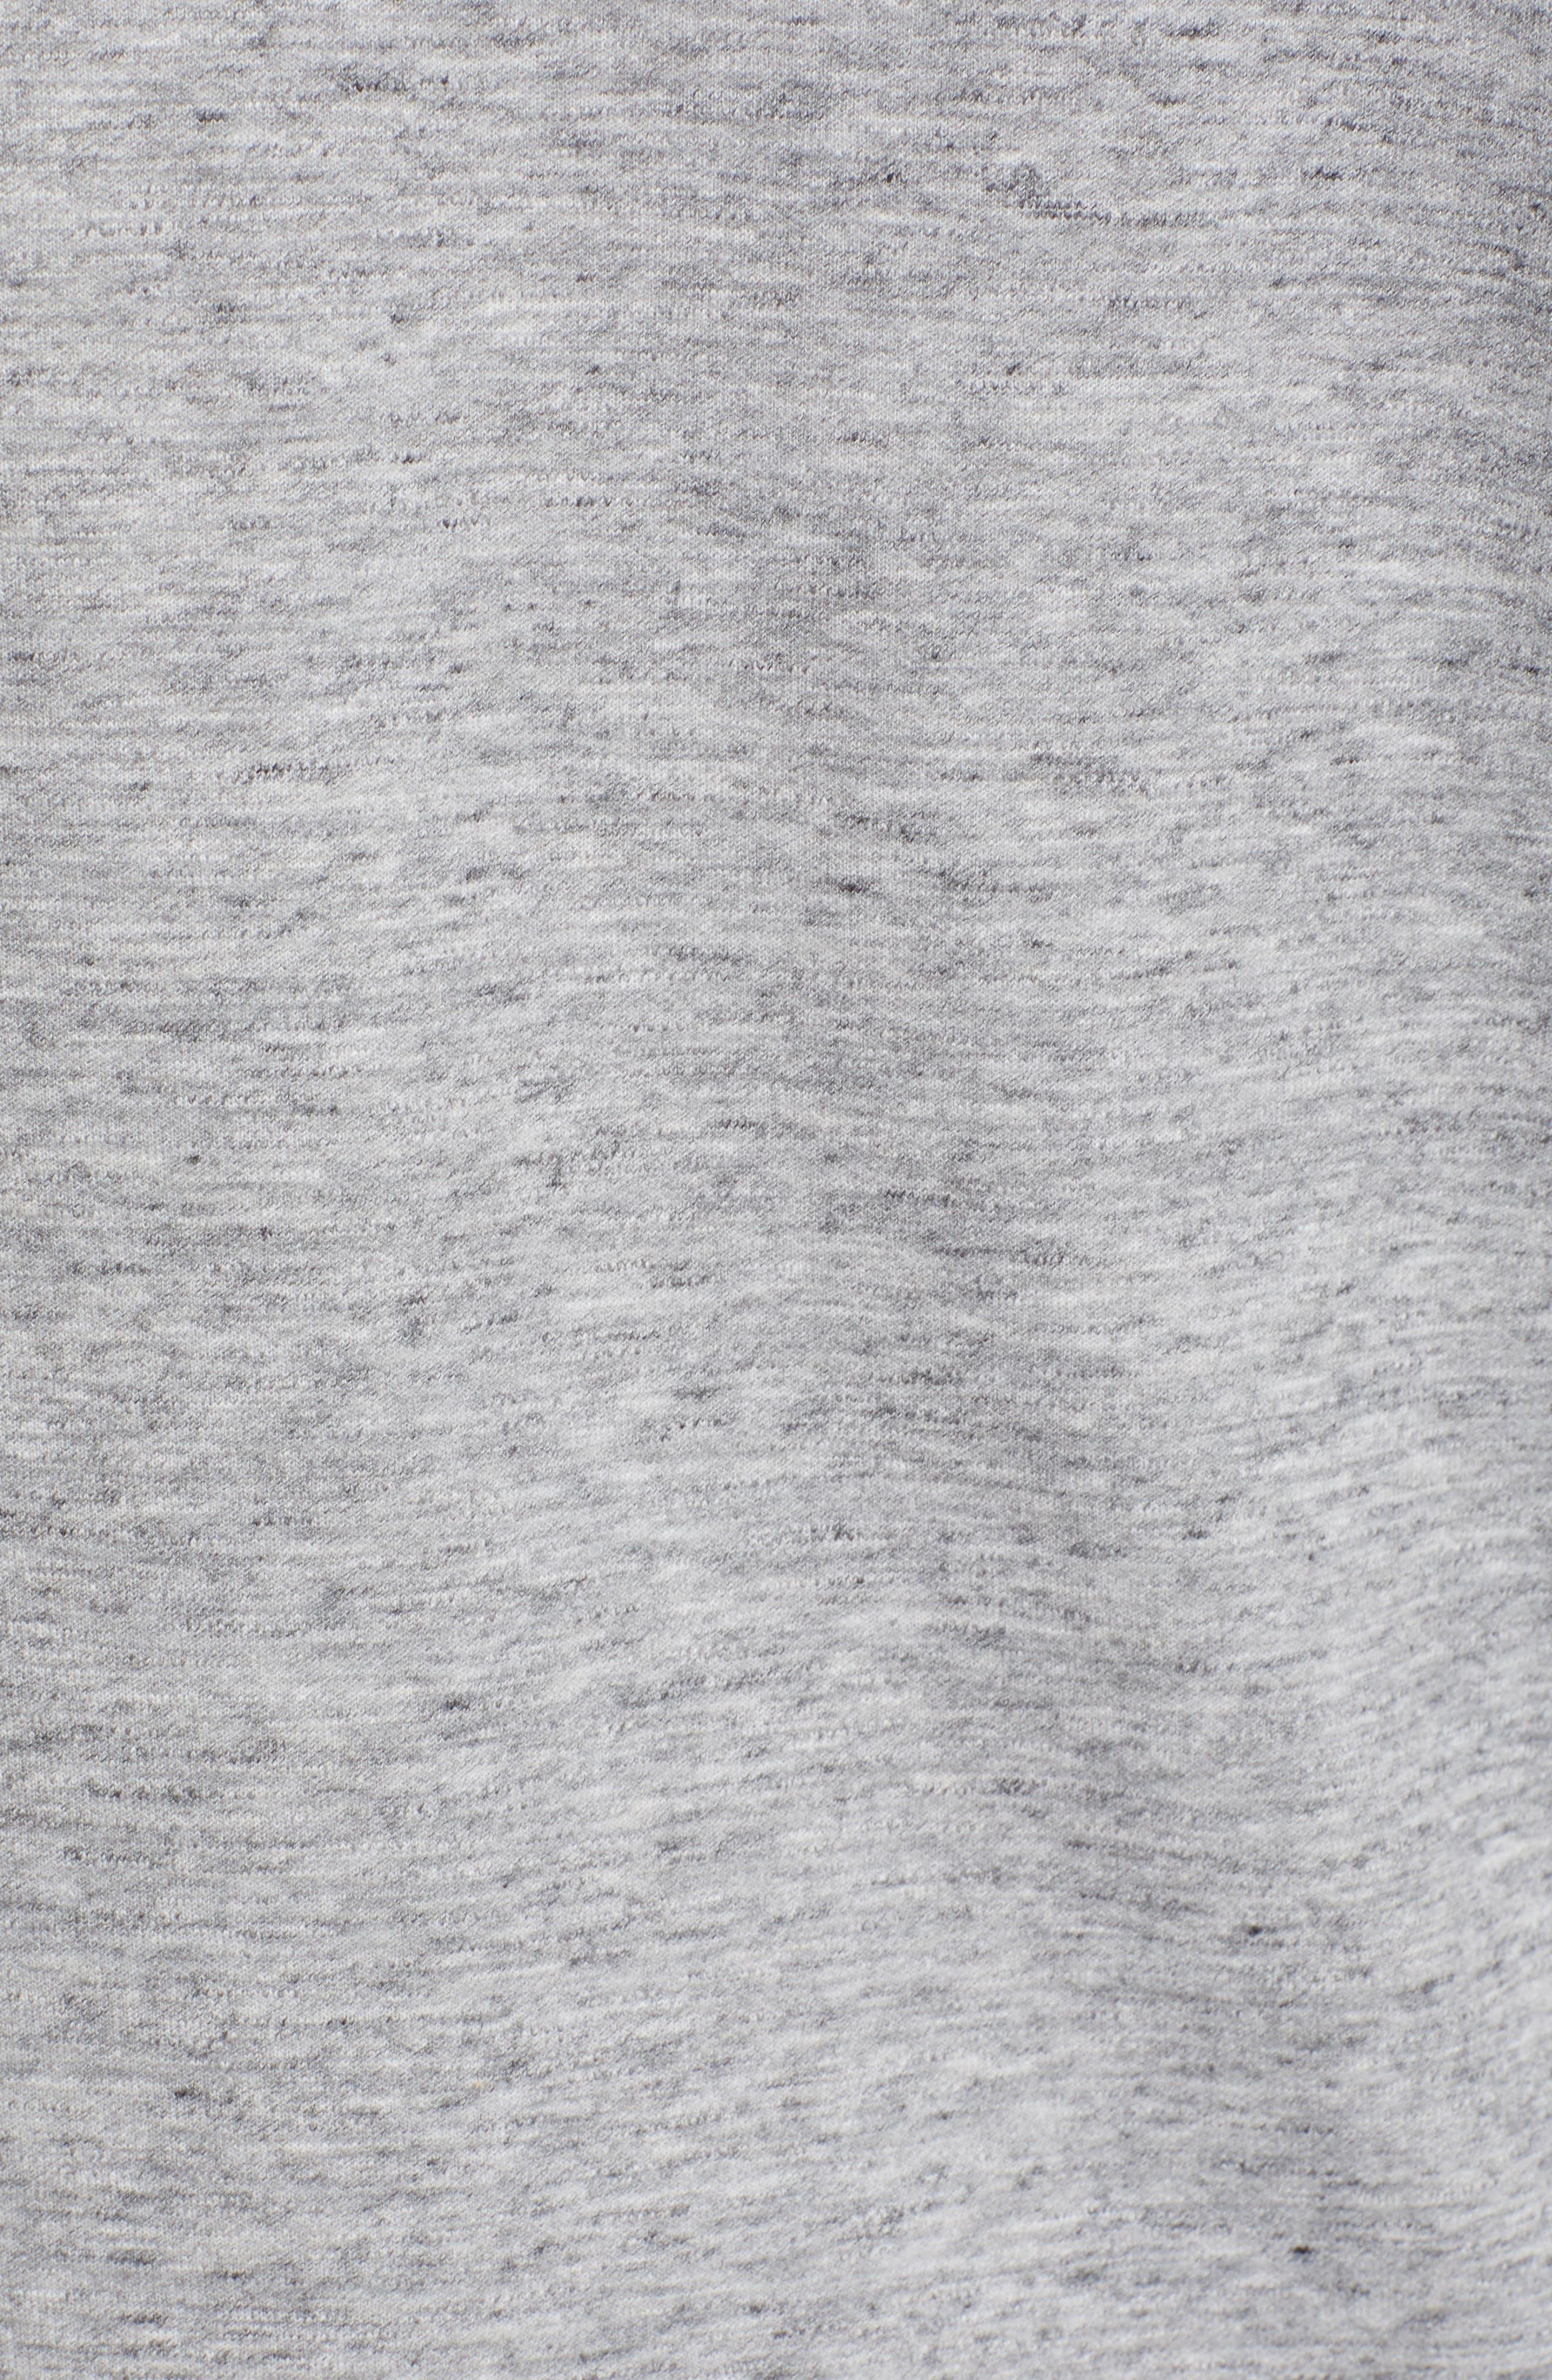 ZELLA, Magnetite Zip Front Hoodie, Alternate thumbnail 6, color, GREY ZINC MELANGE